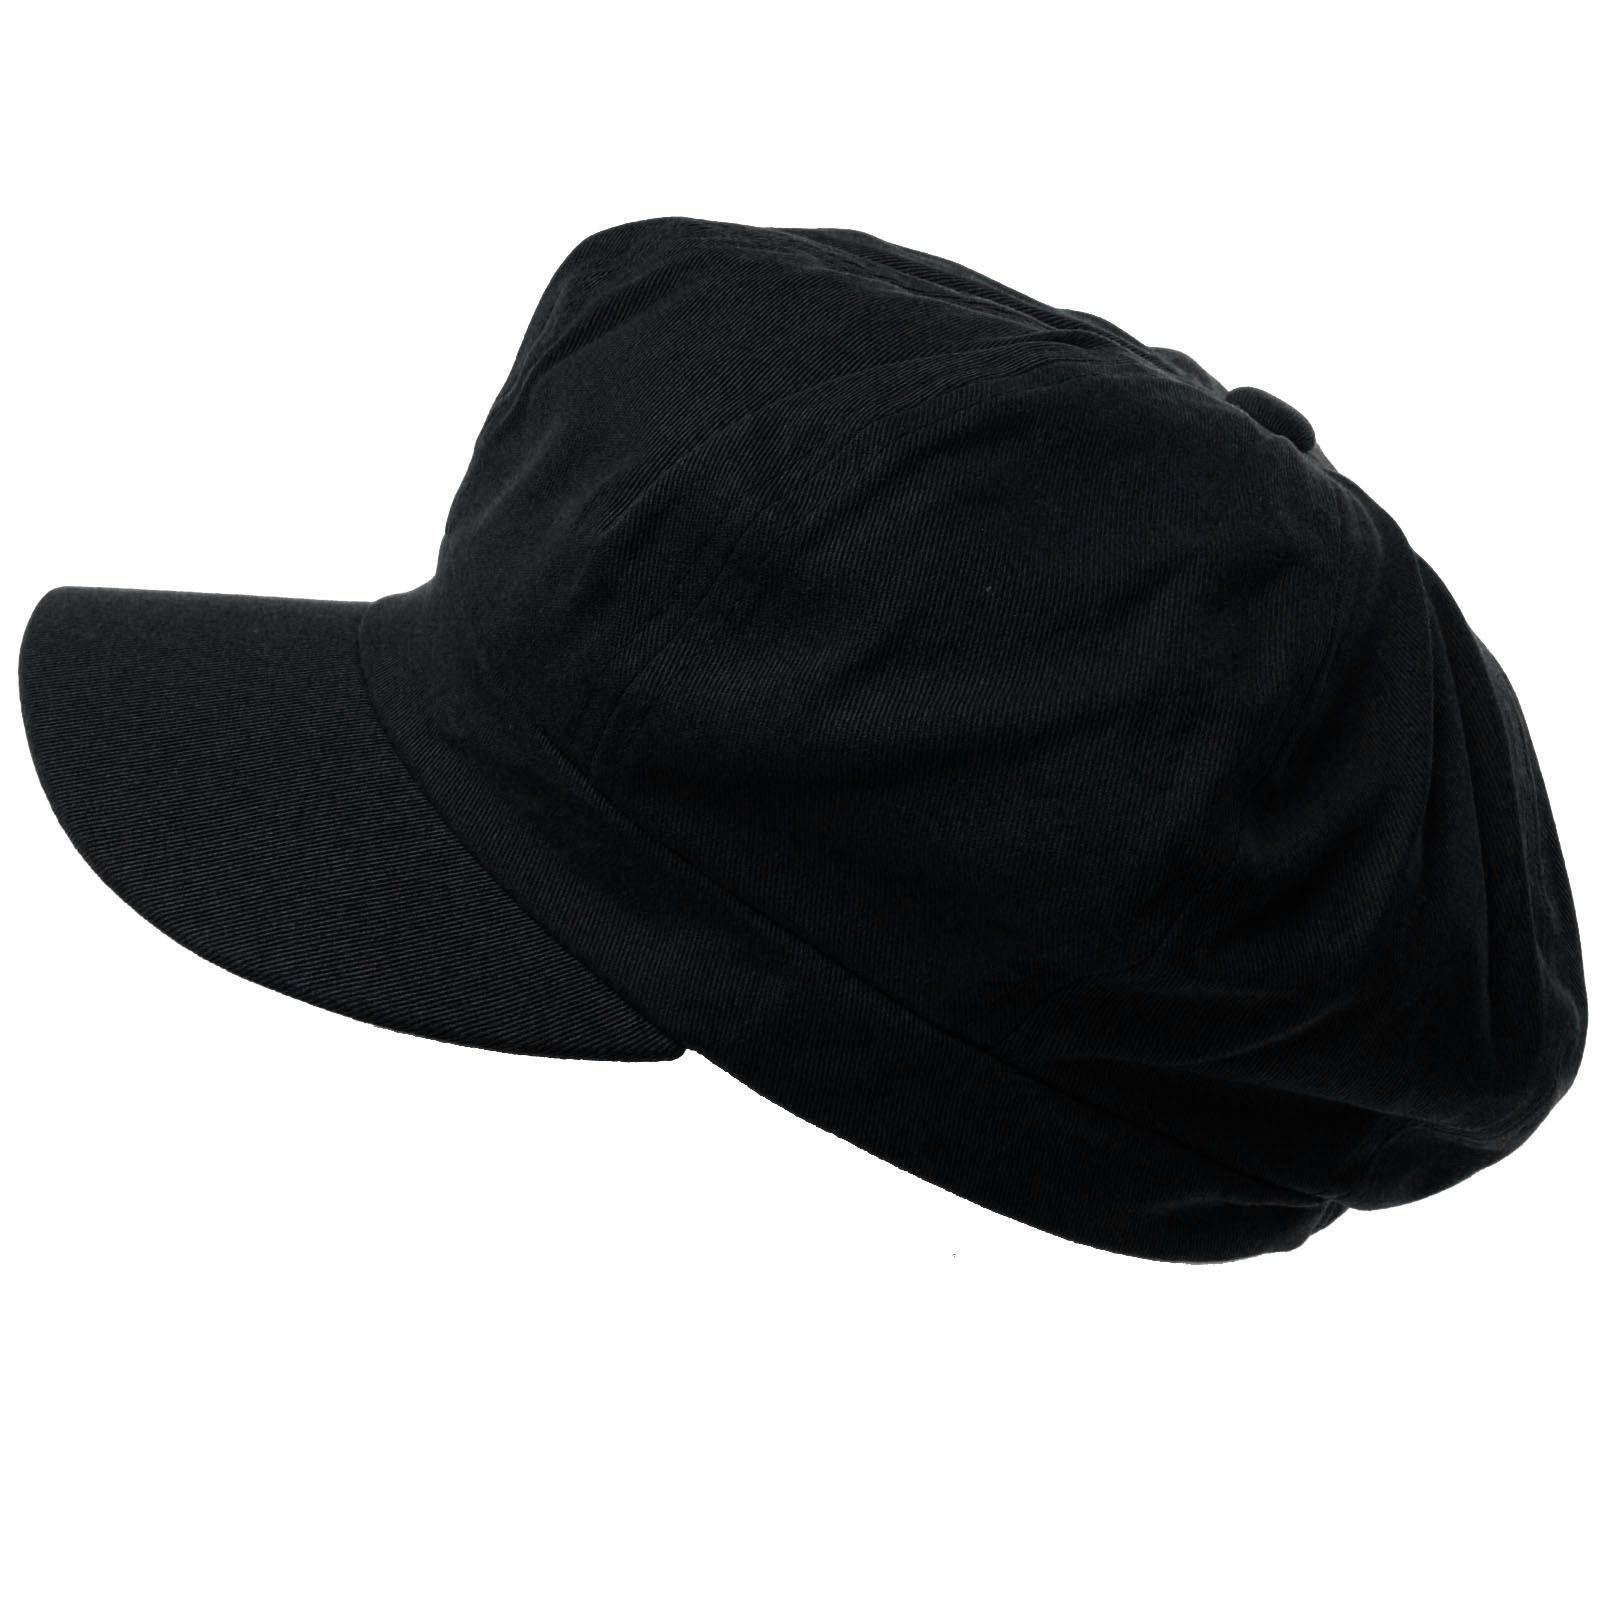 Summer 100% Cotton Plain Blank 8 Panel Newsboy Gatsby Apple Cabbie Cap Hat Black